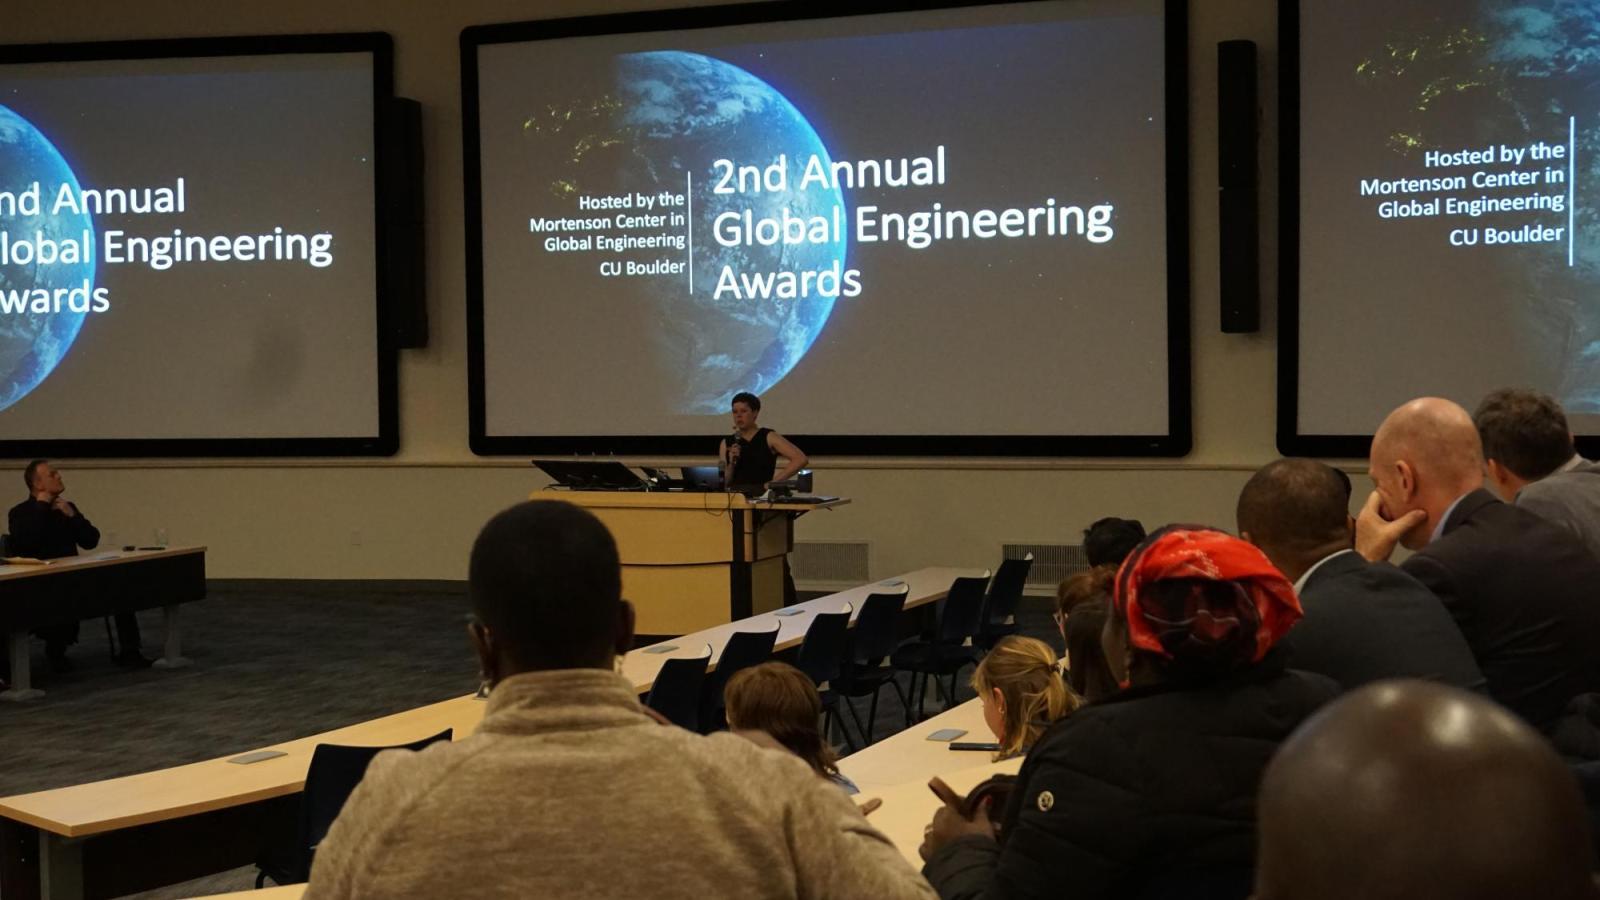 Mortenson Center Managing Director Laura MacDonald addresses the 2020 Global Engineering Awards